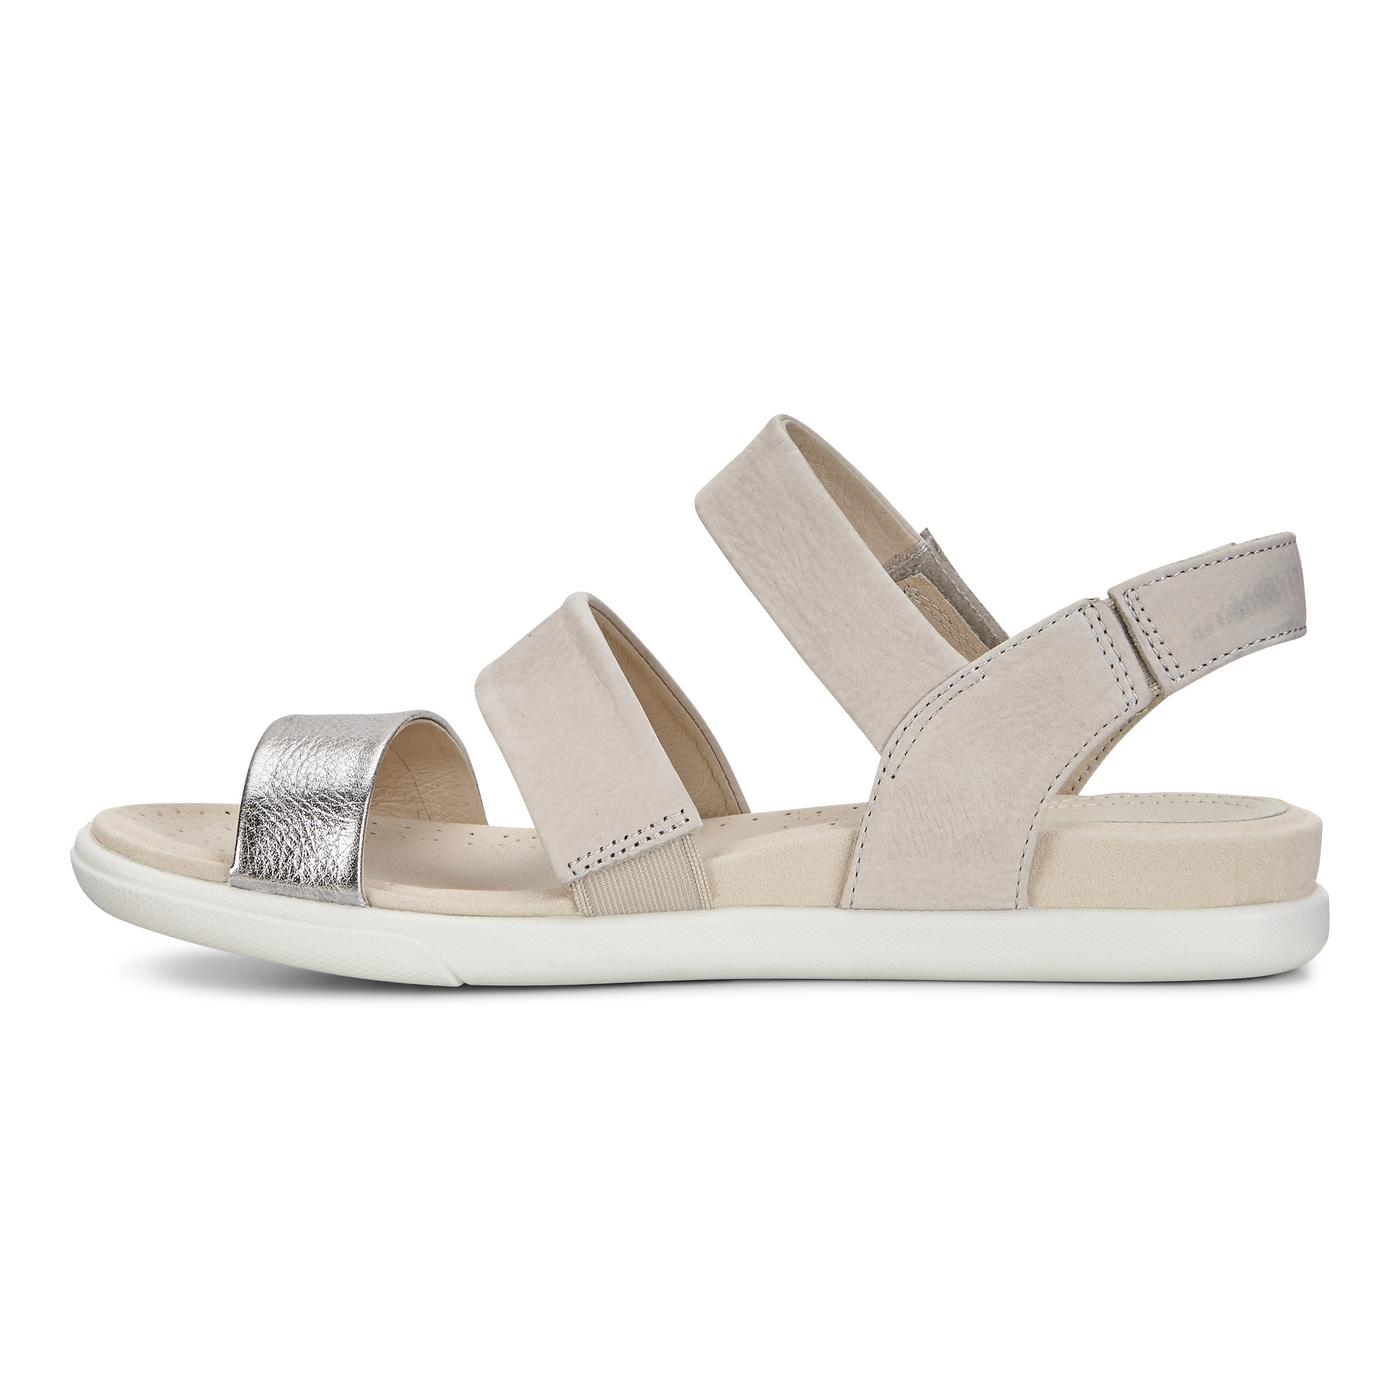 ECCO Damara Modern Sandal